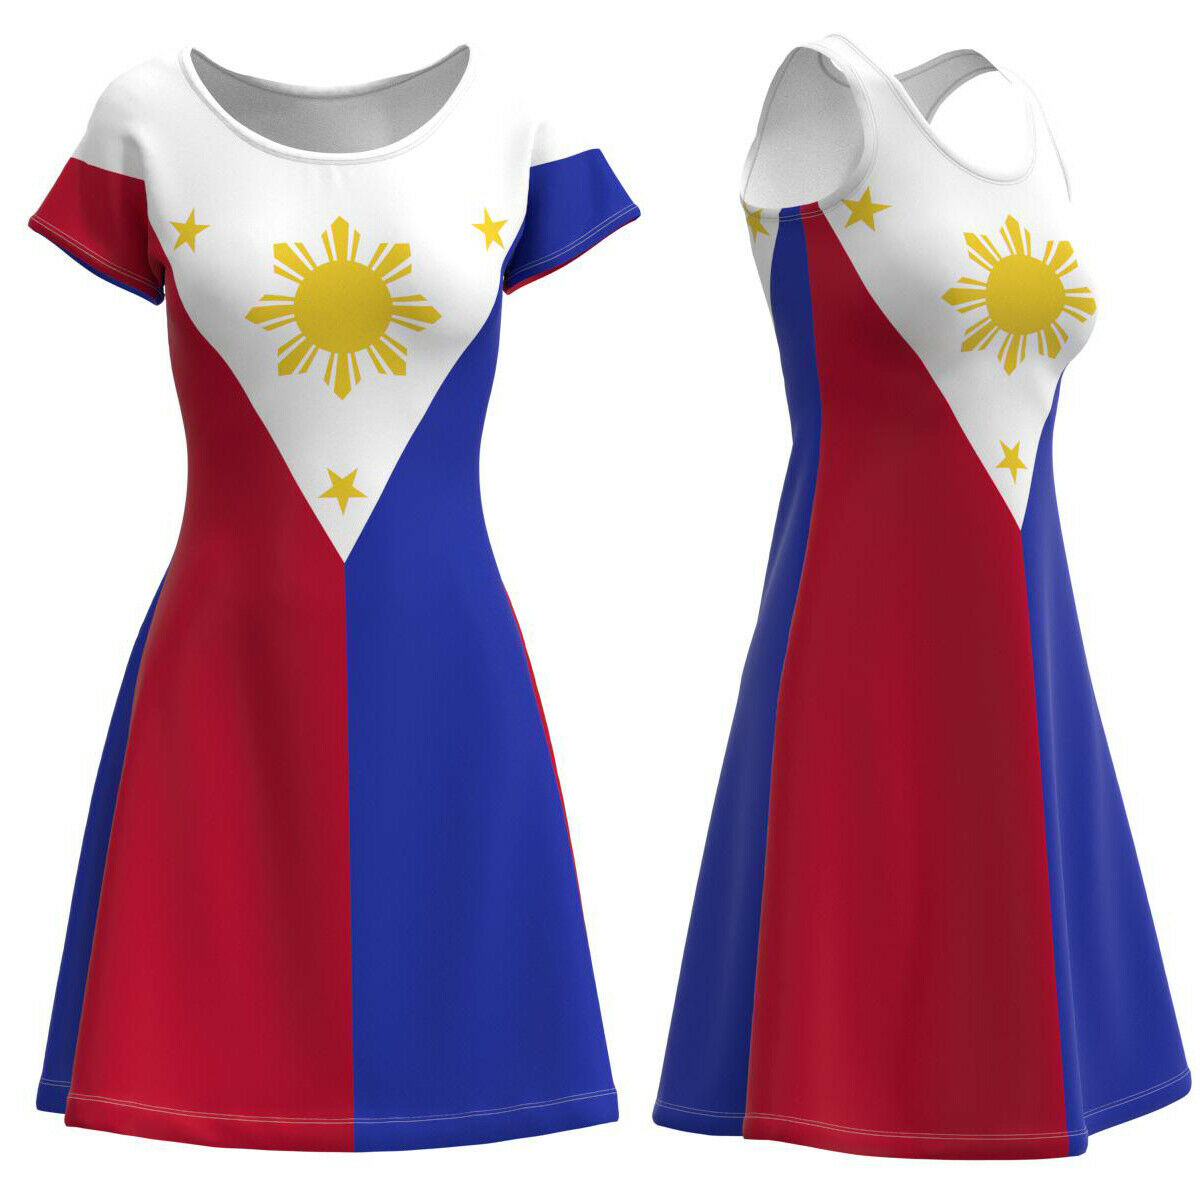 Philippines Flag Filipino Women's Short Sleeve Sleeveless Dress Size XS-5XL Plus